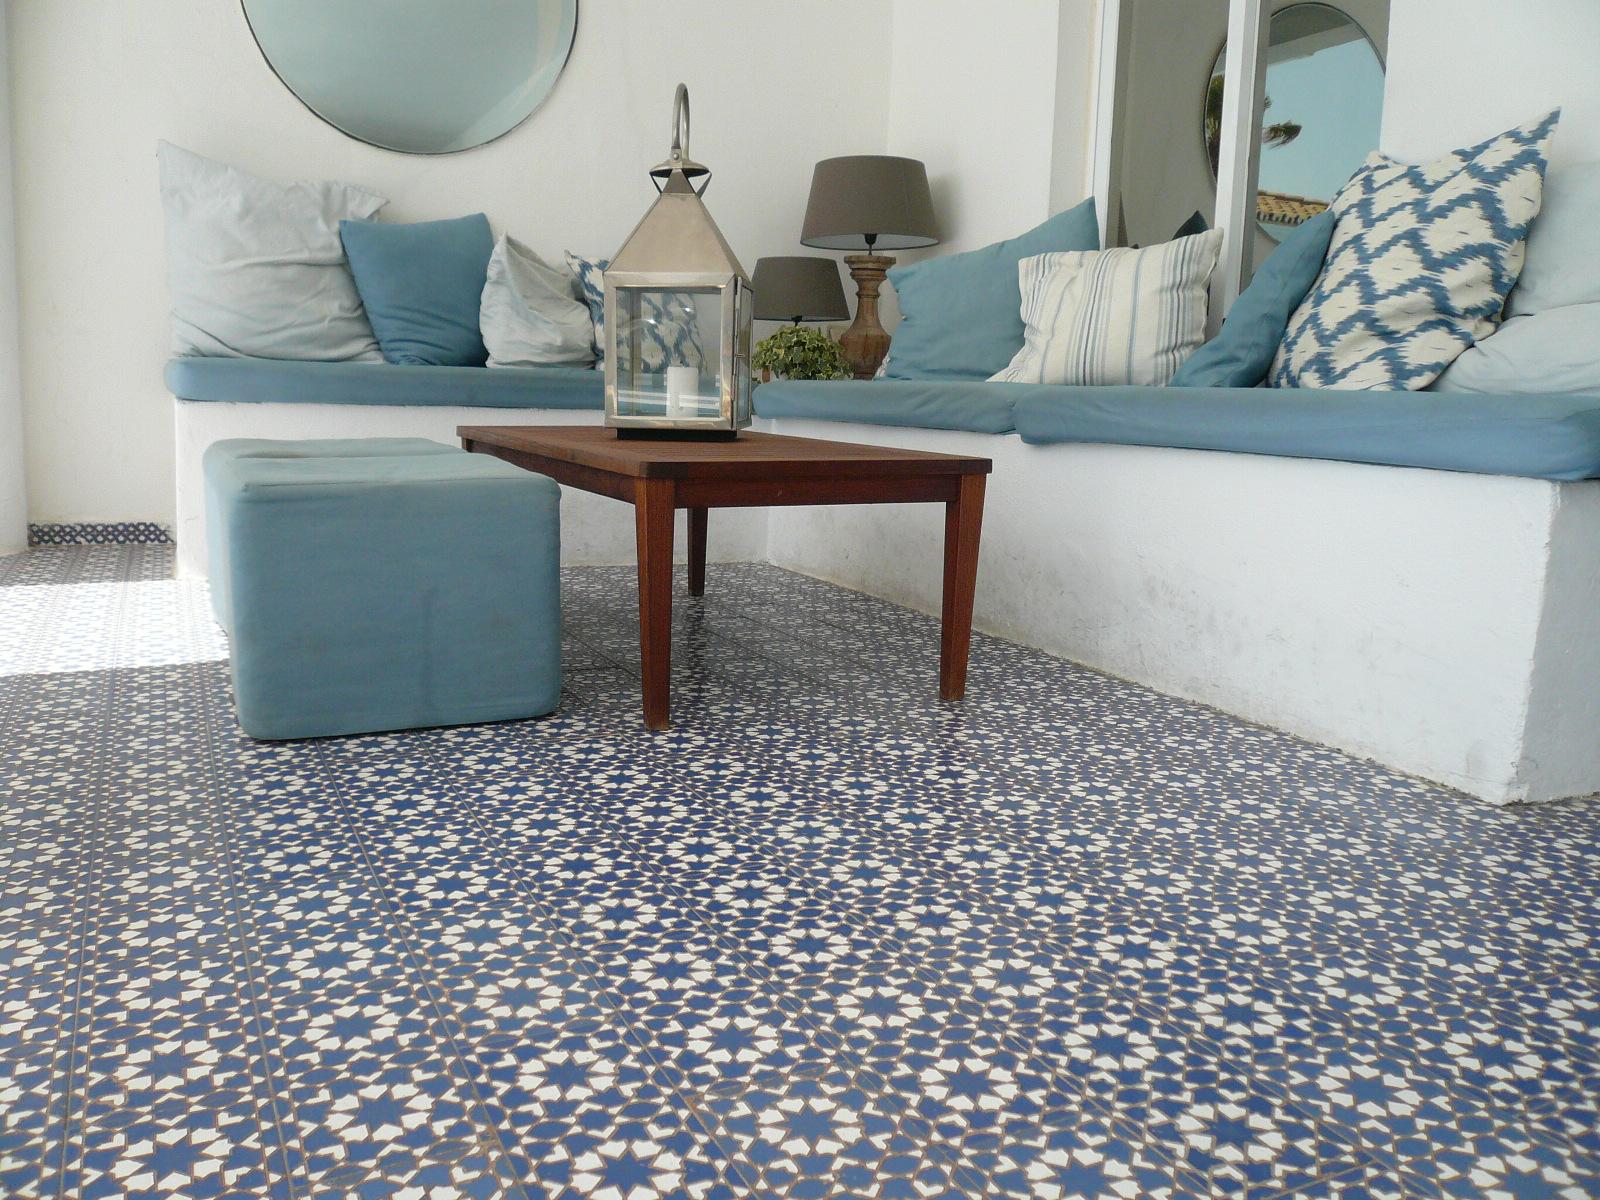 Sierbestrating en tuintegels startpagina voor tuin idee n uw - Tuin marokkaans terras ...